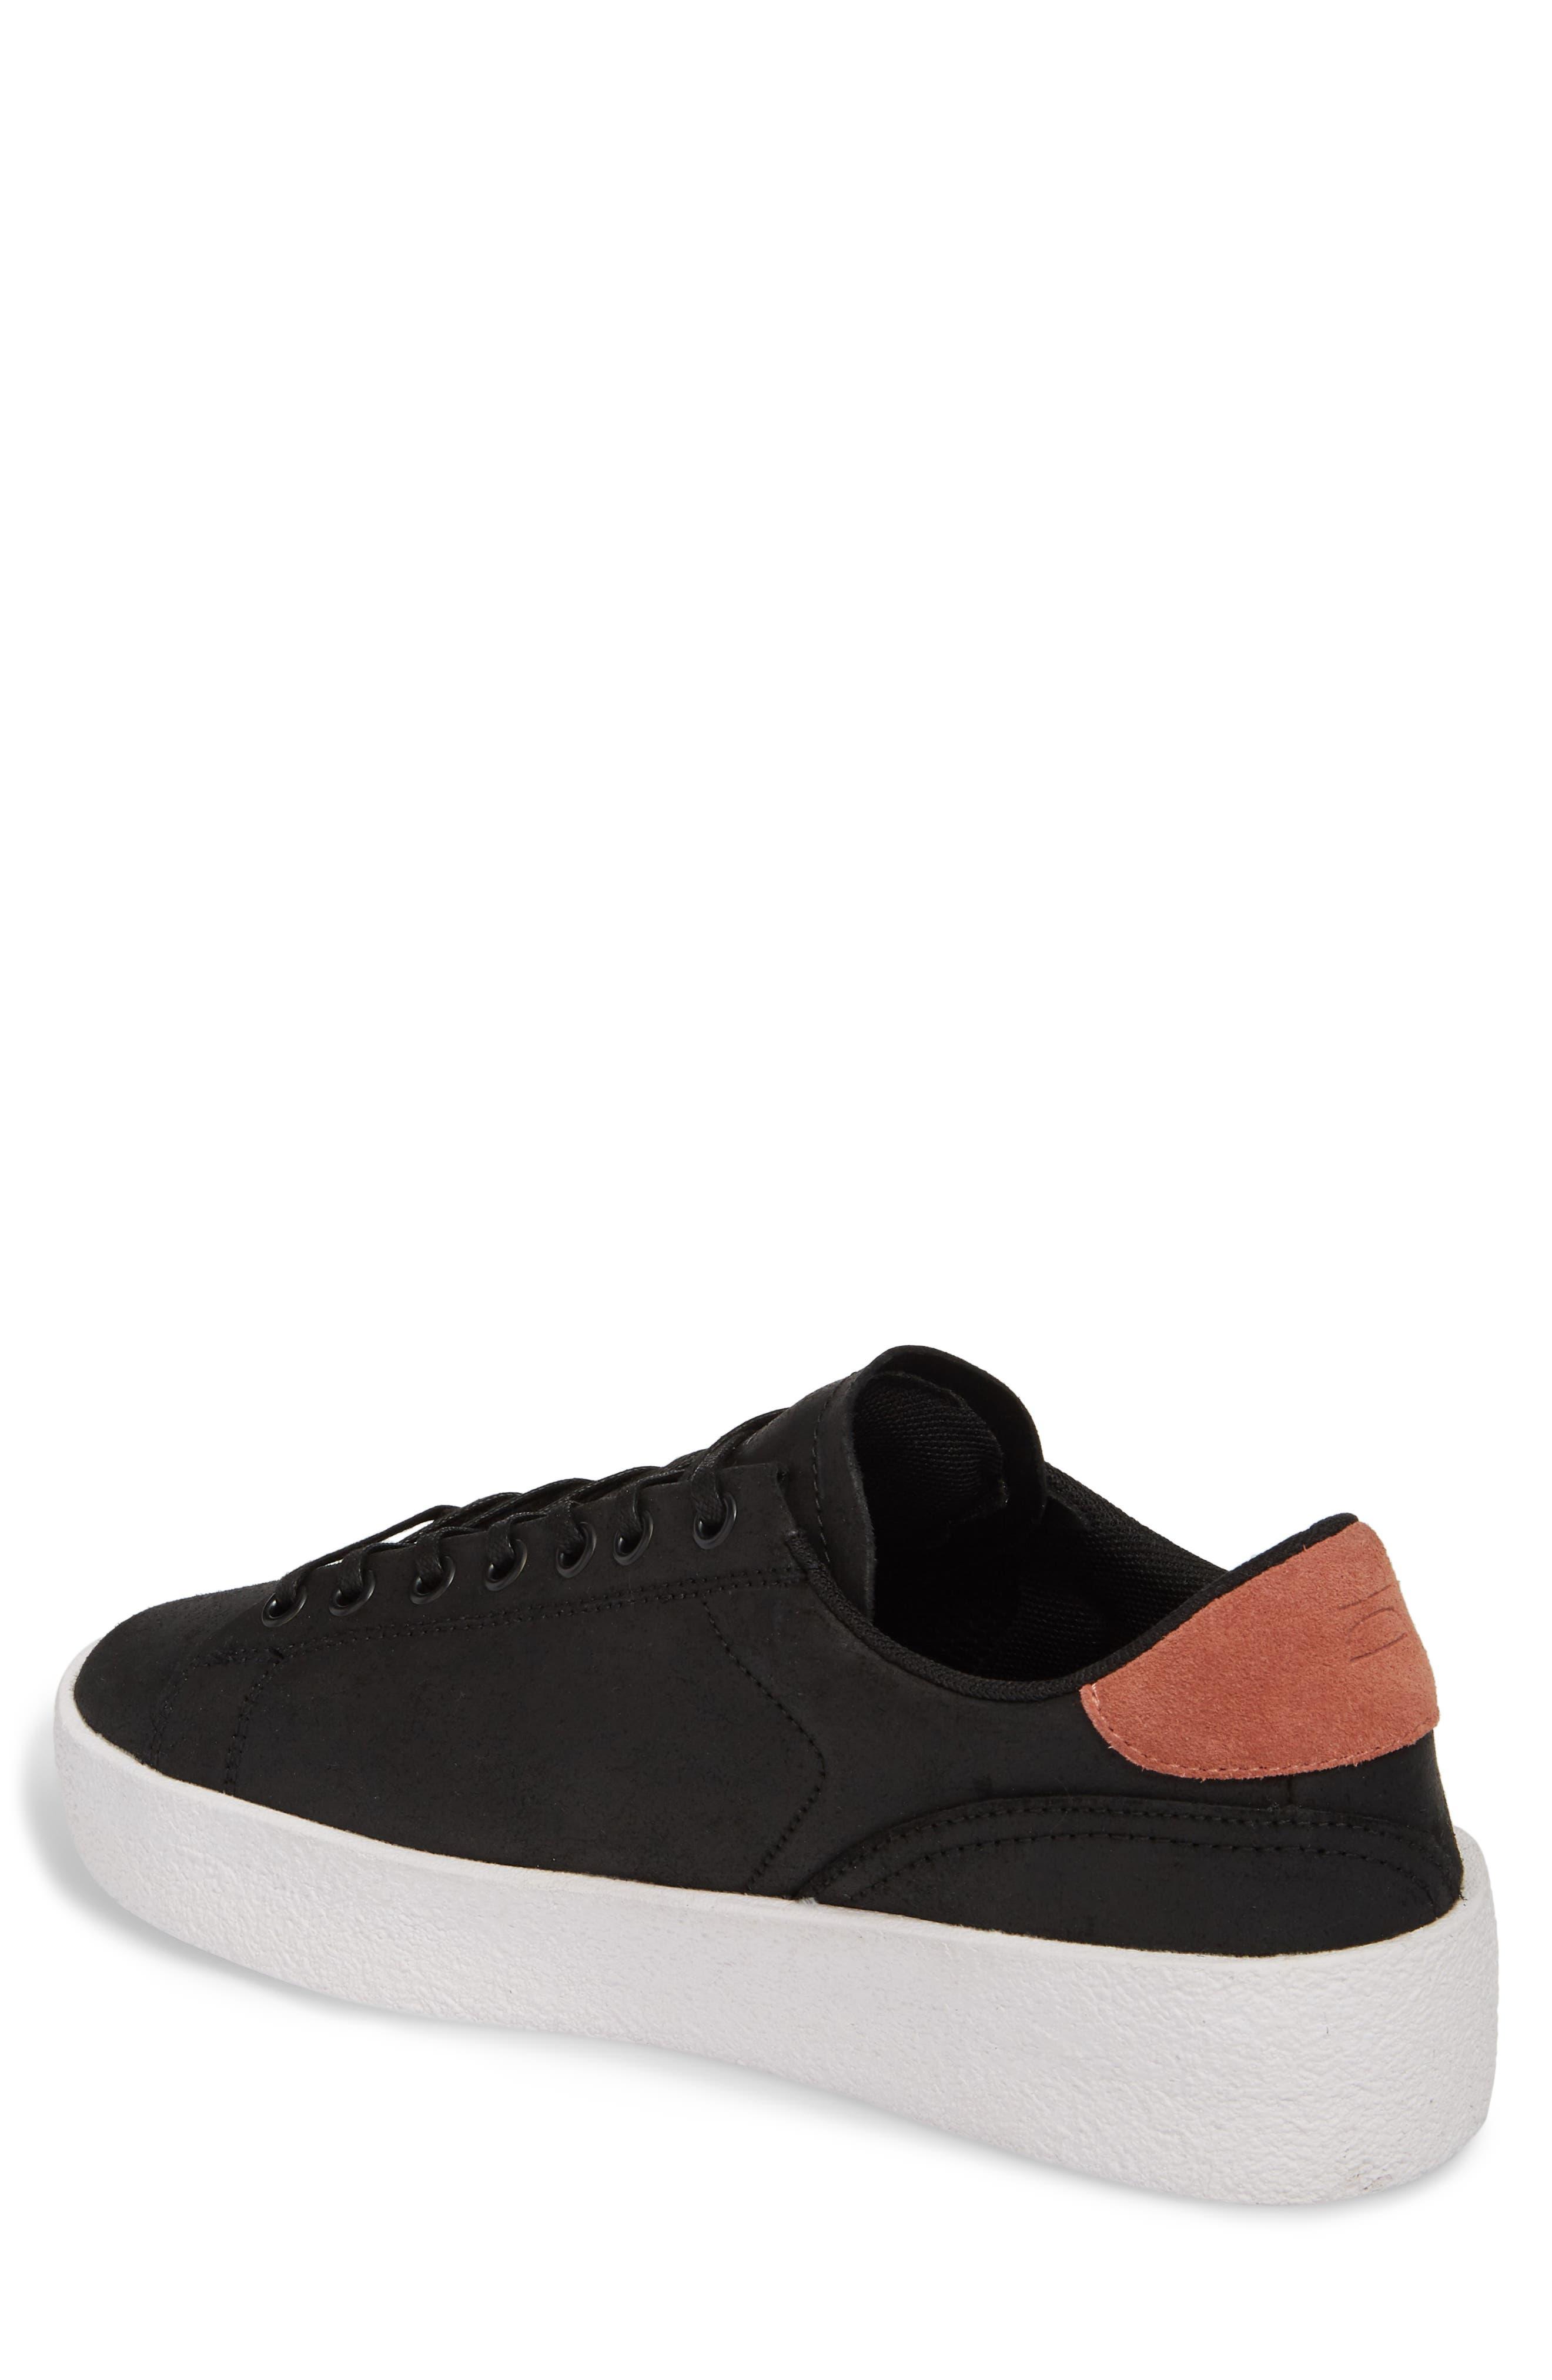 Jones Platform Sneaker,                             Alternate thumbnail 2, color,                             Black Leather